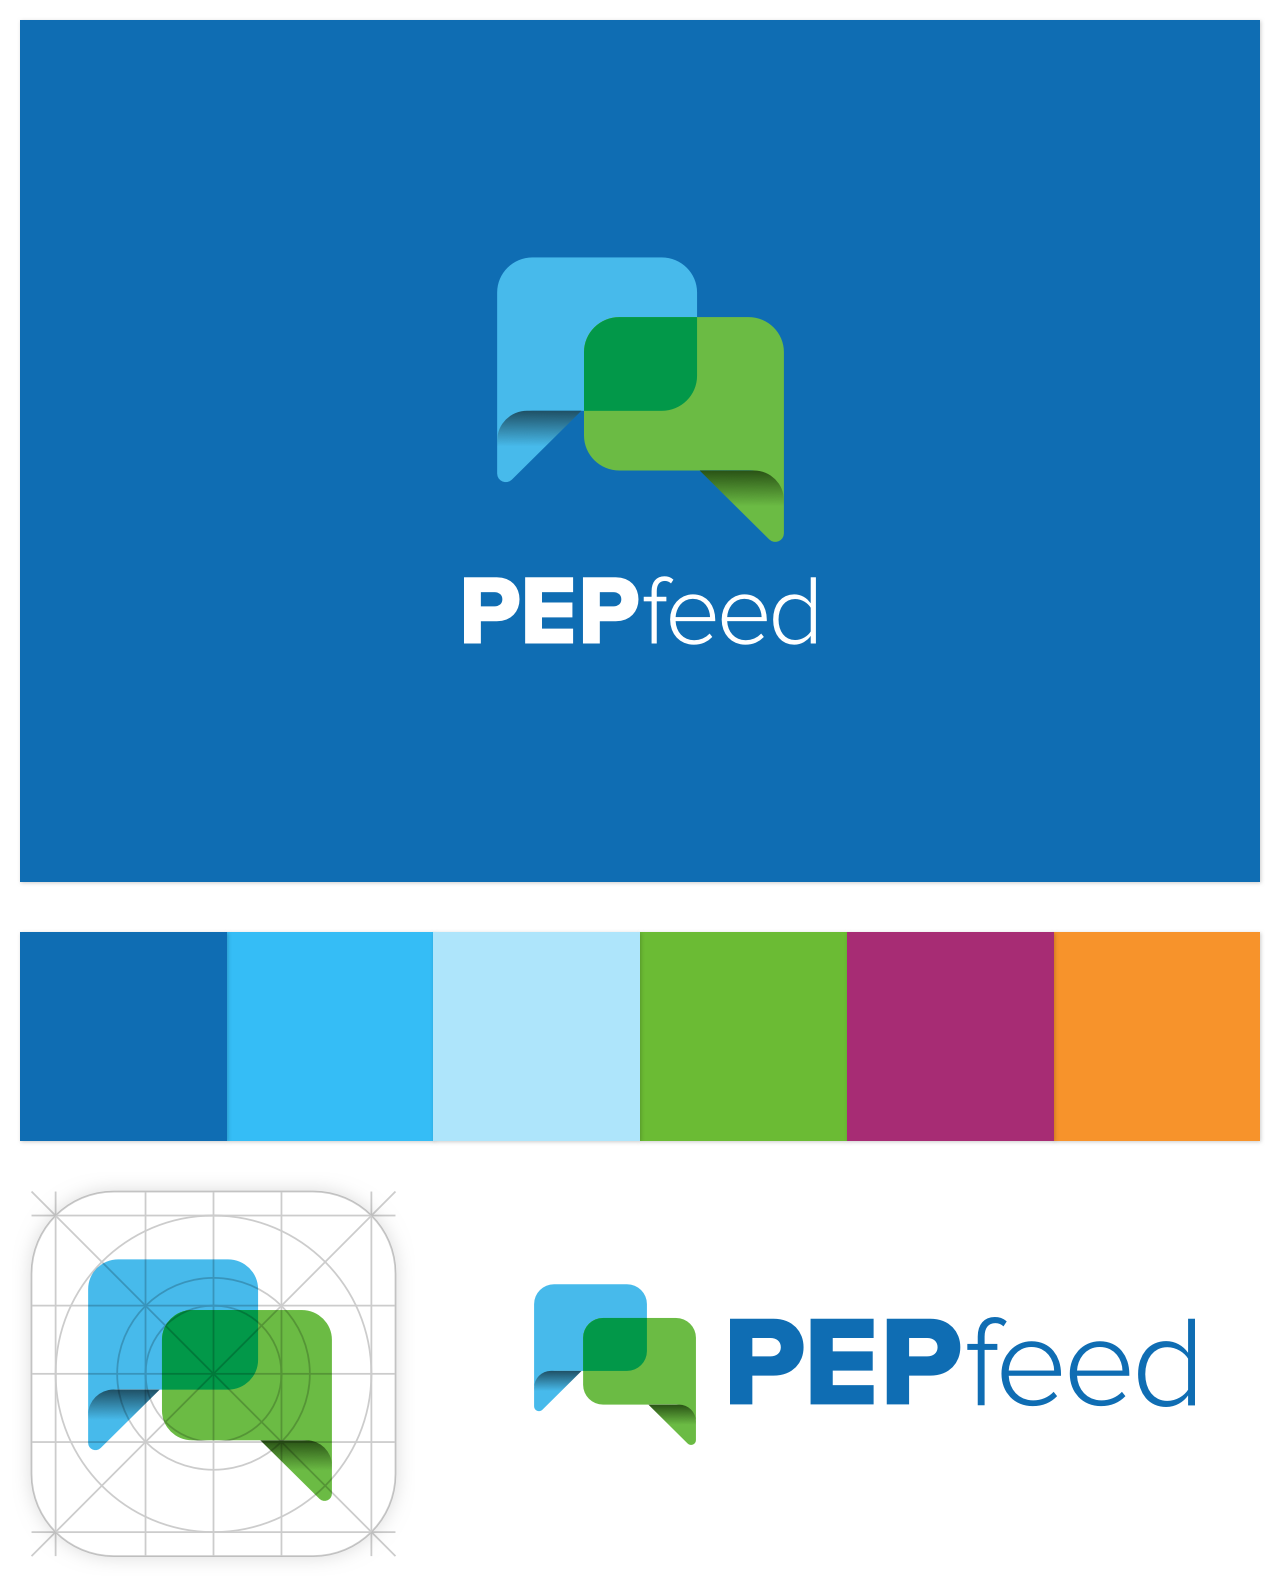 PepFeed Identiy.png